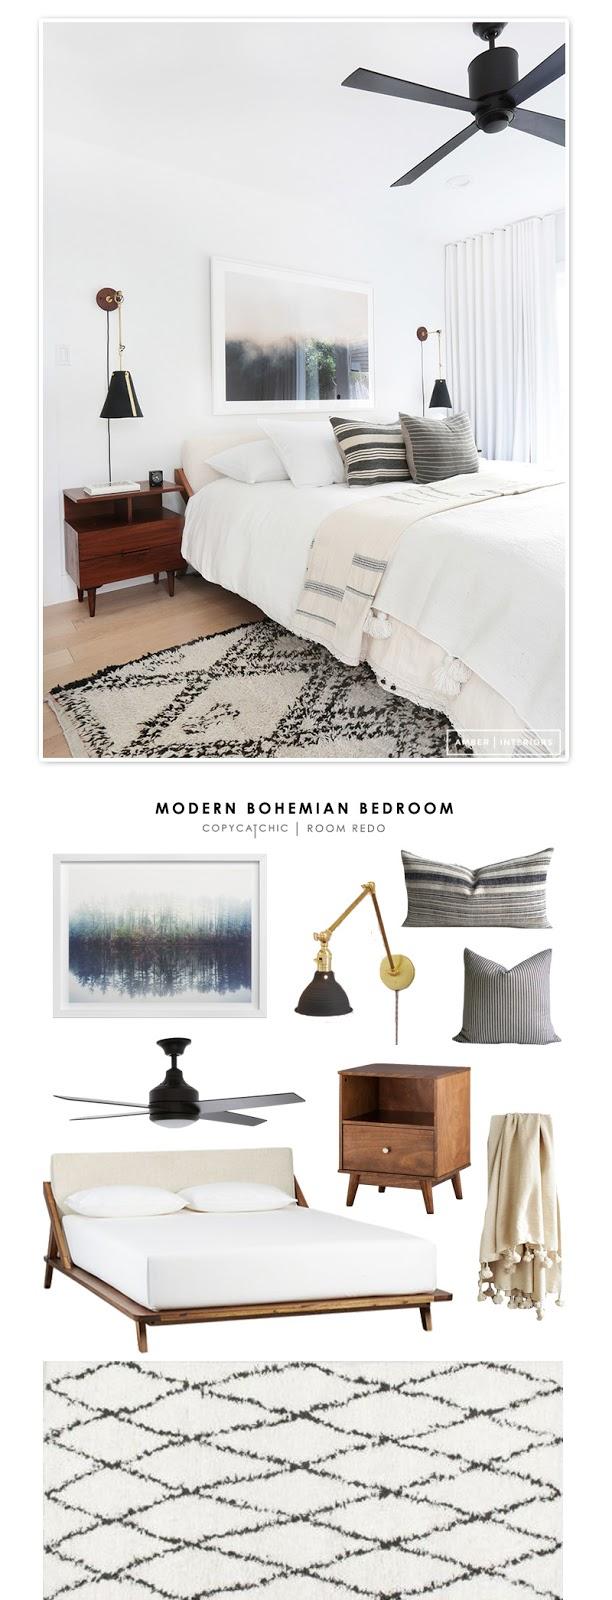 Copy Cat Chic Room Redo | Modern Bohemian Bedroom ... on Modern Boho Bedroom  id=54617